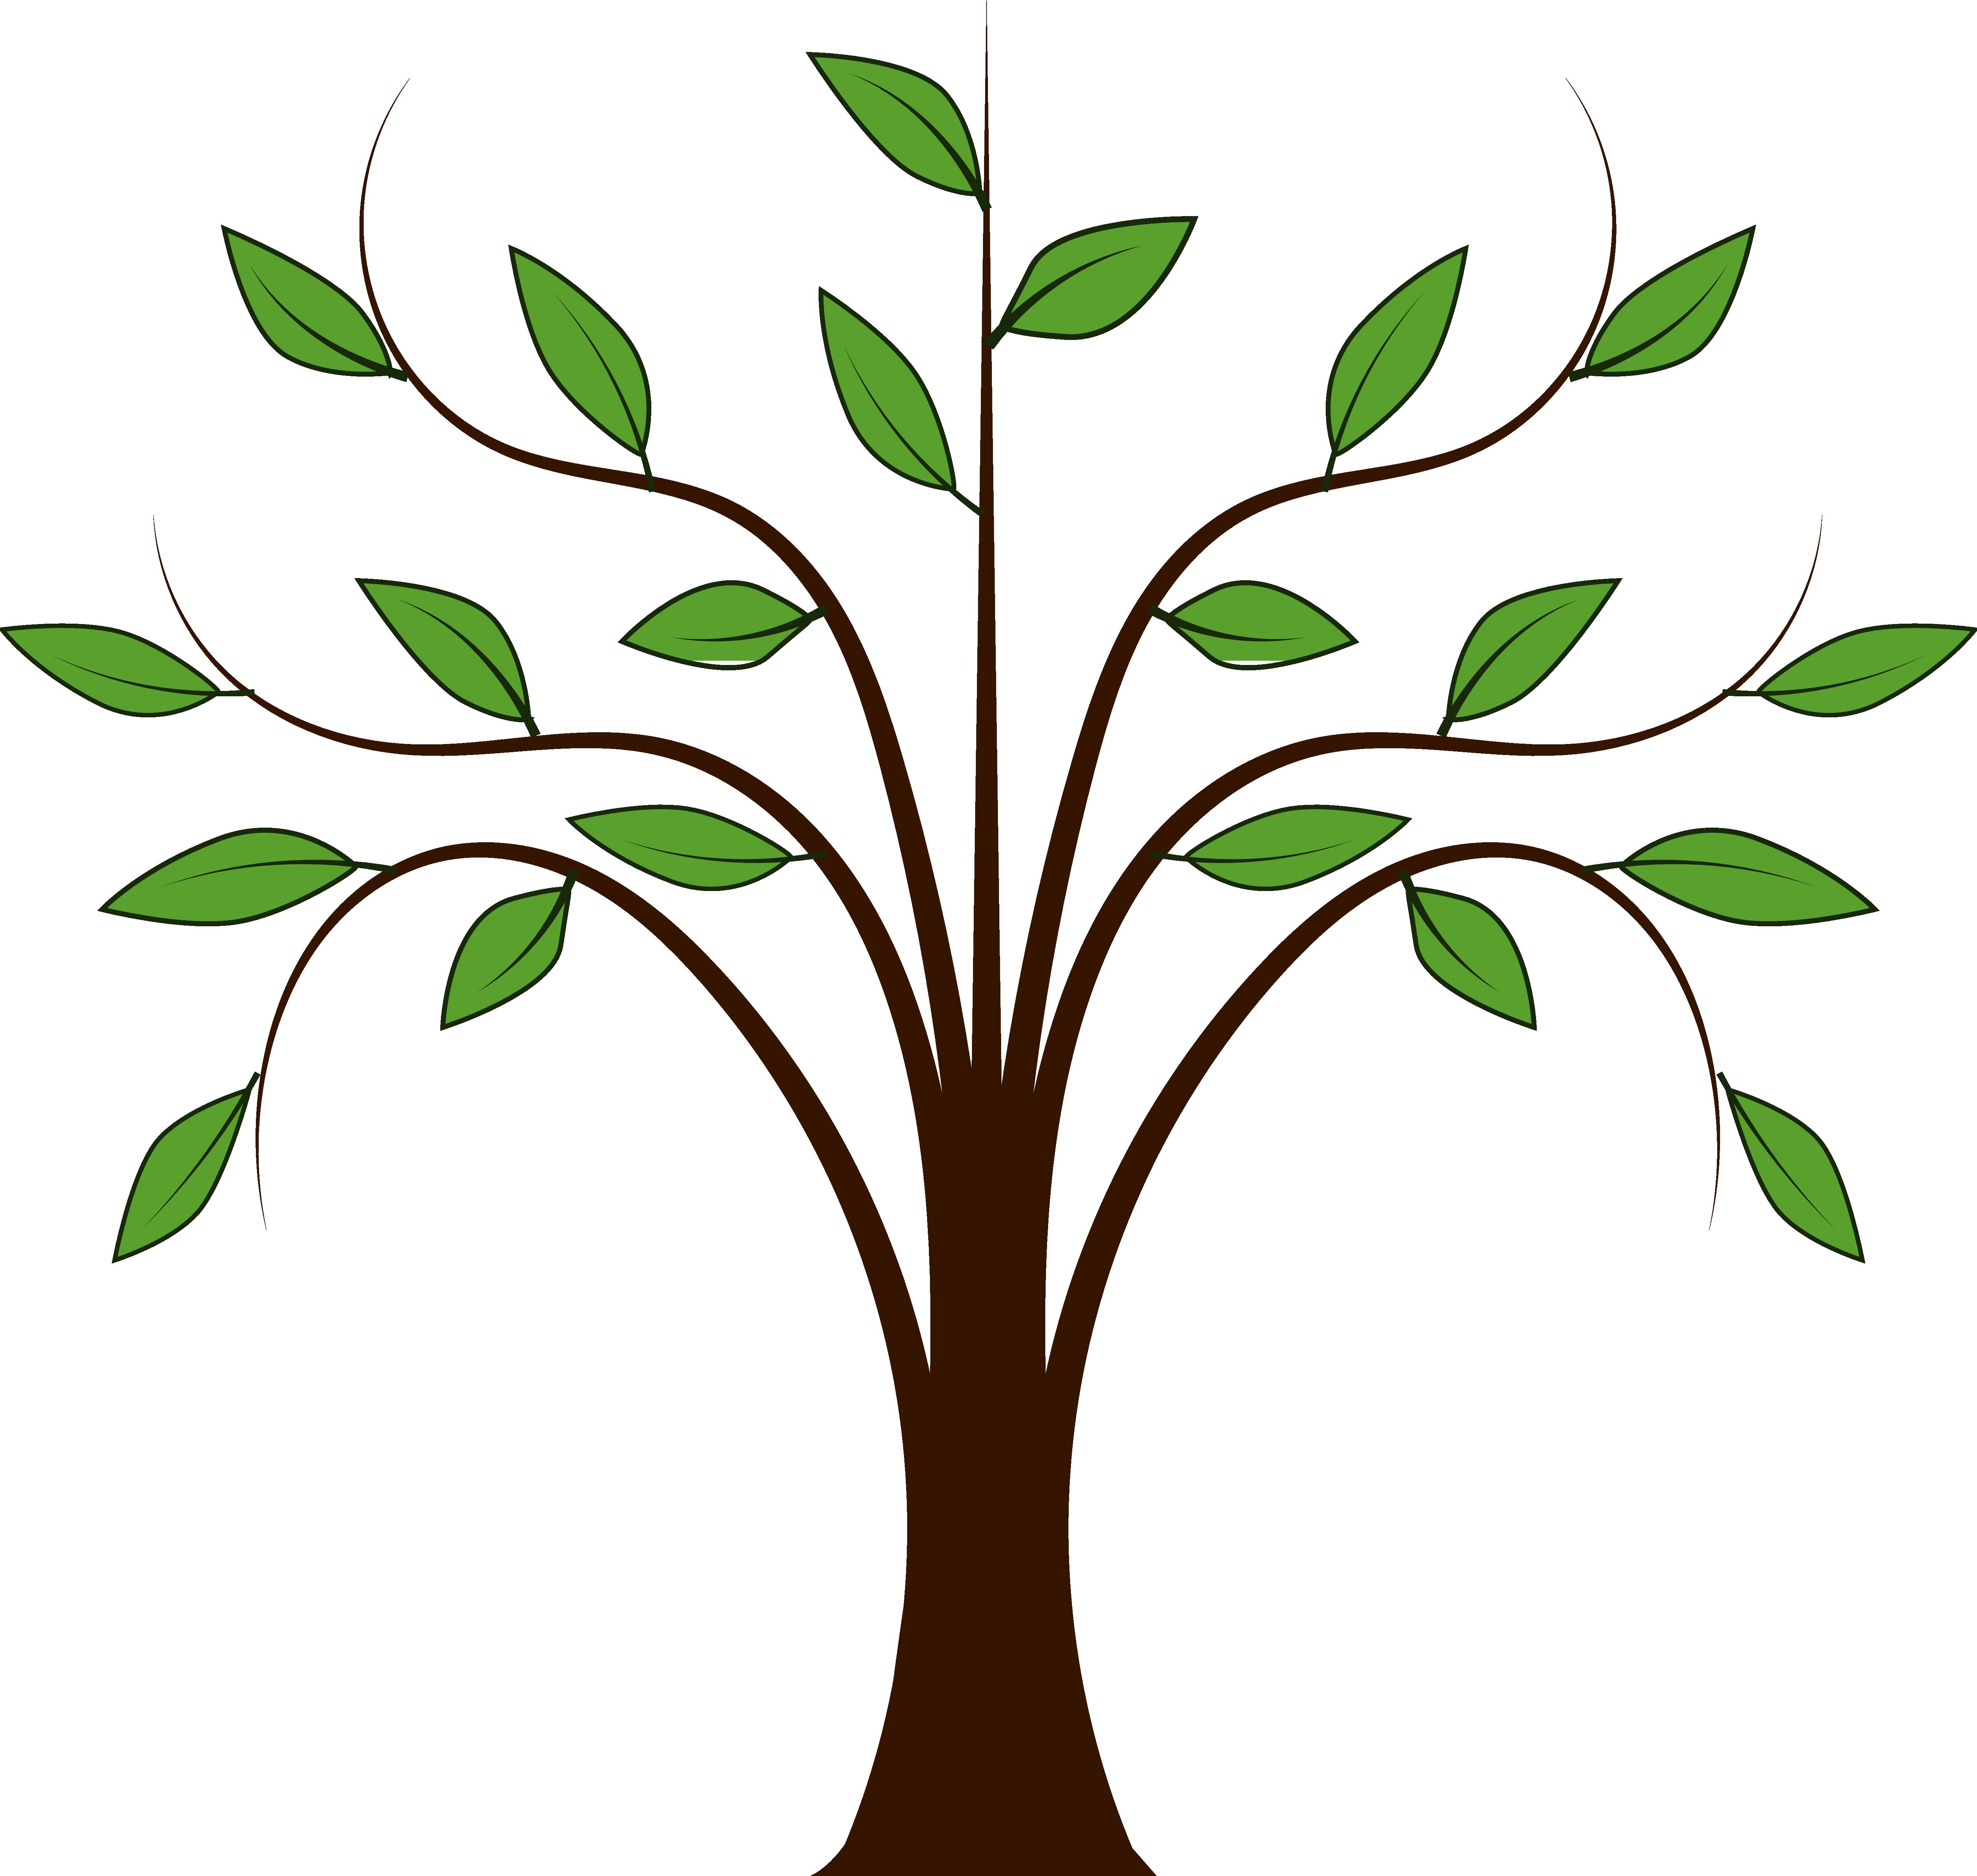 oak tree clip art images - photo #45